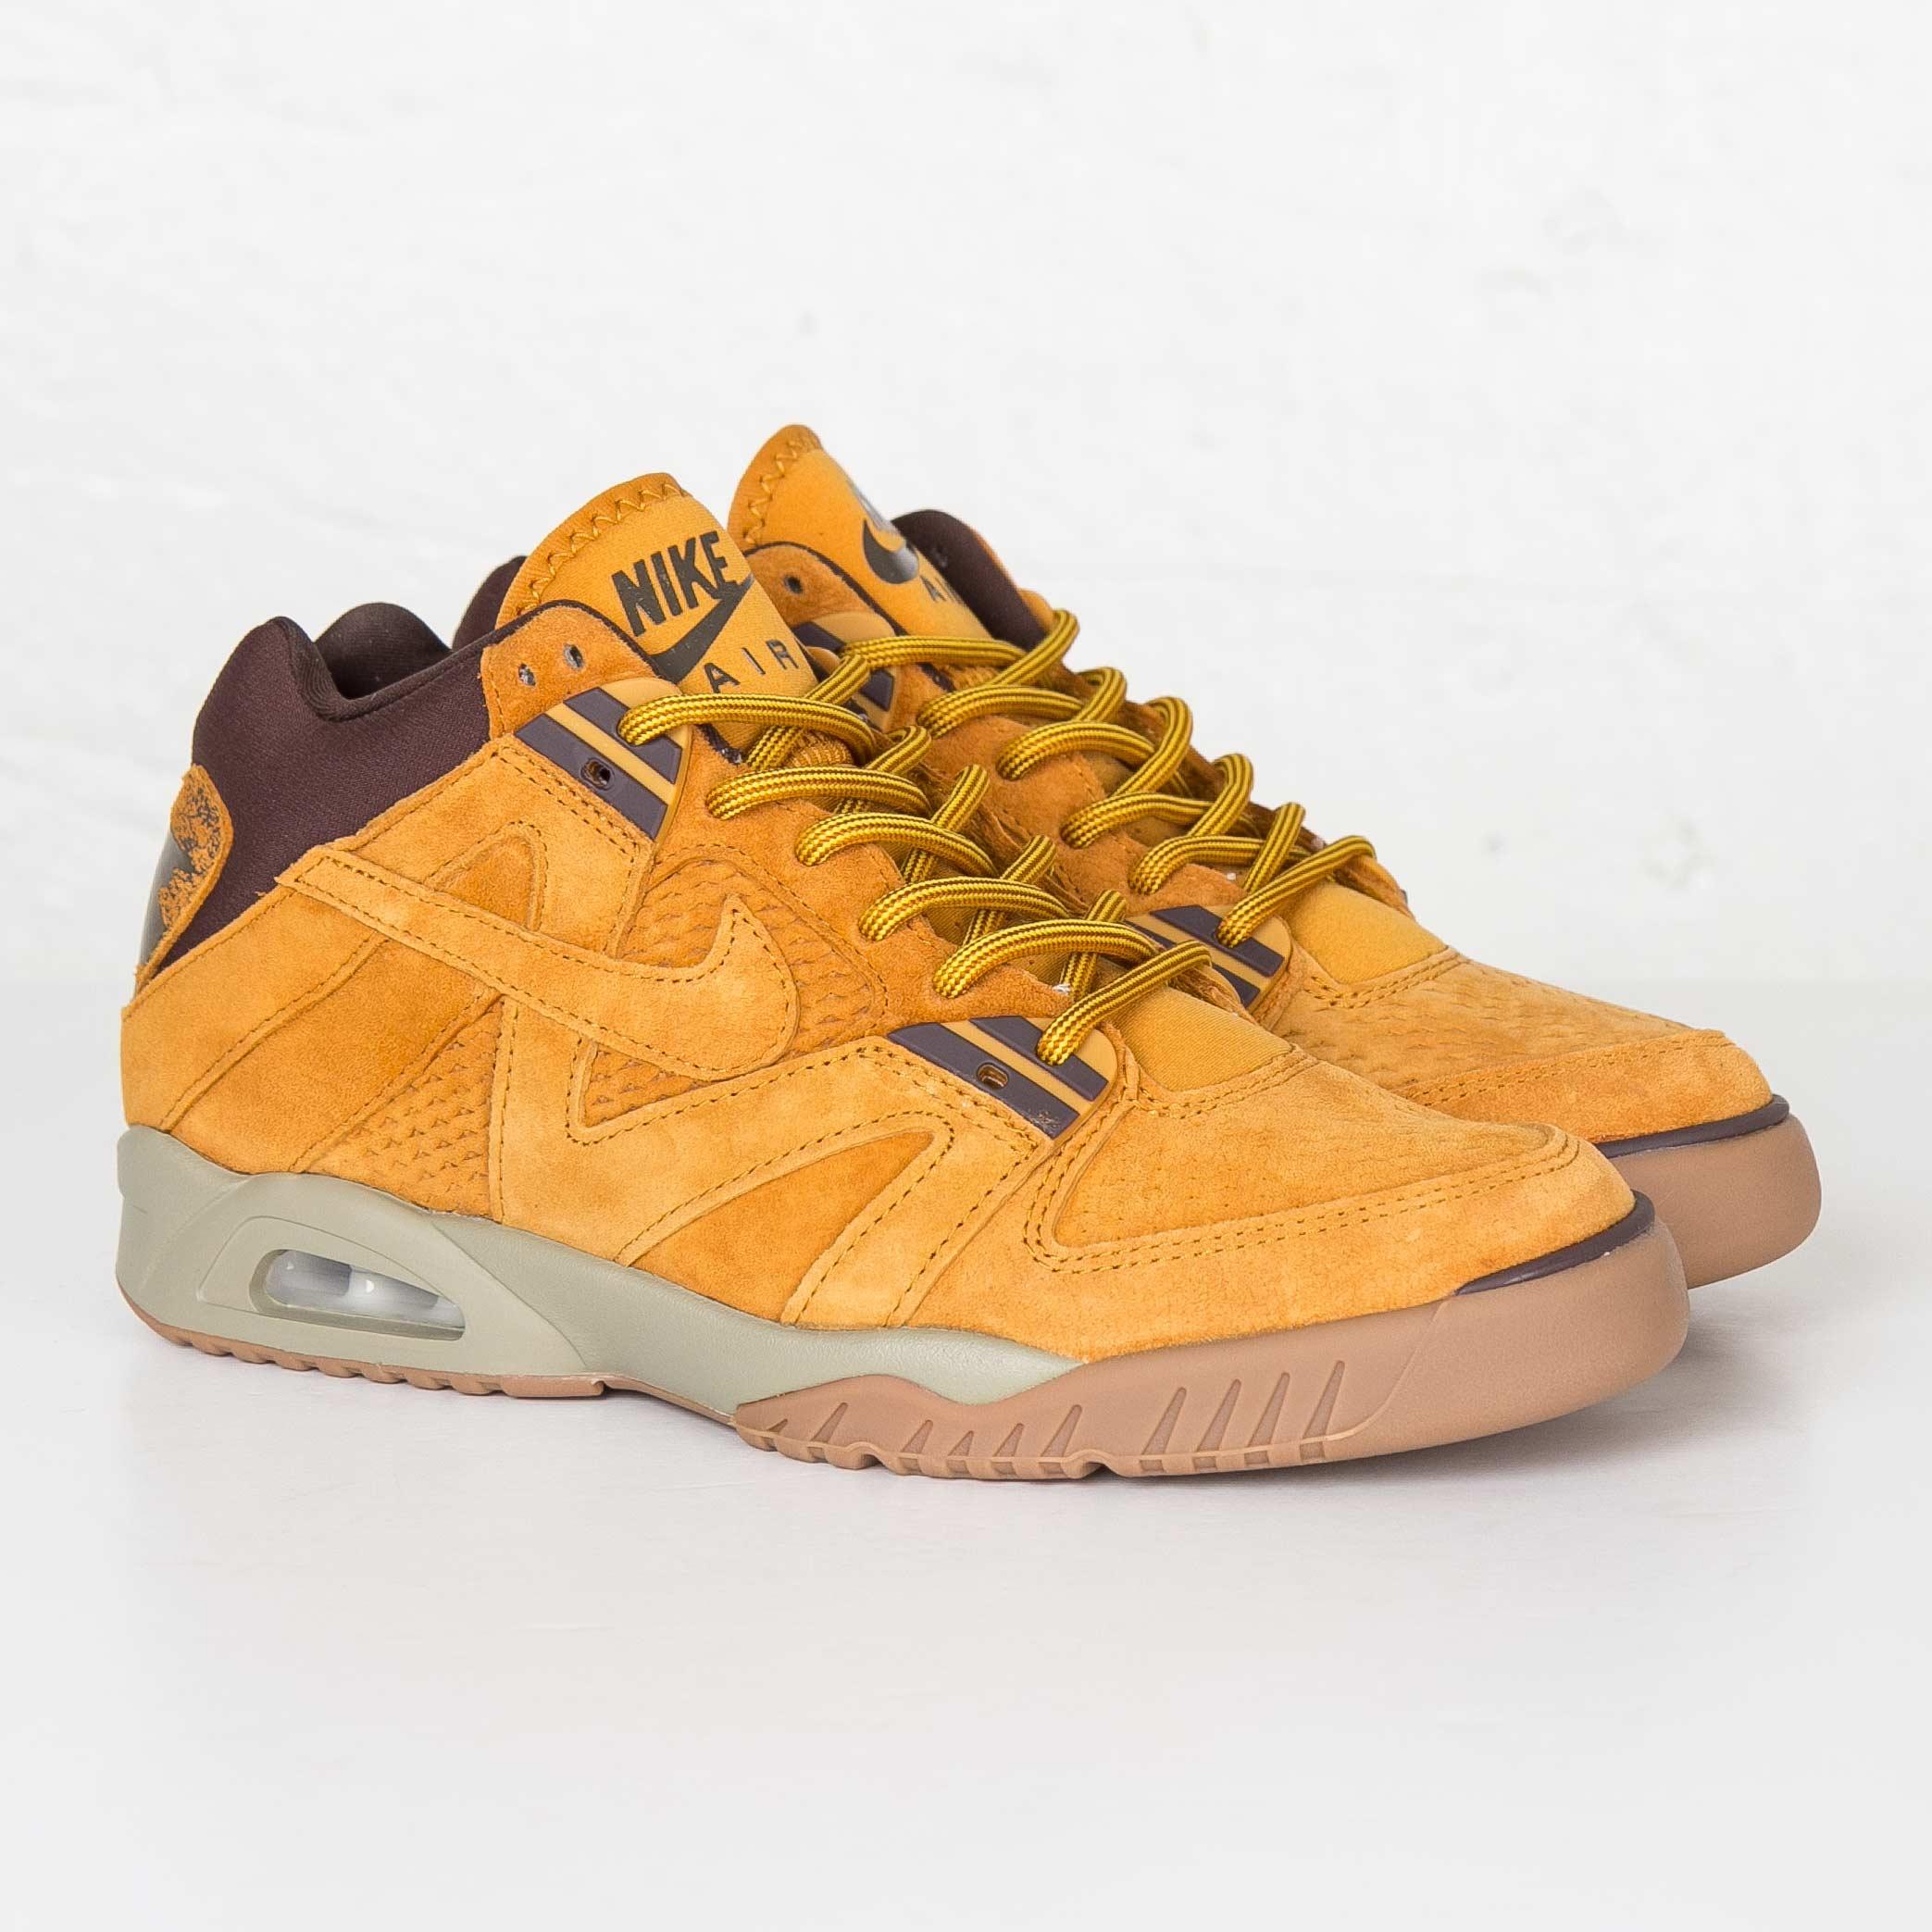 00636e2521d9 Nike Air Tech Challenge III - 749957-700 - Sneakersnstuff